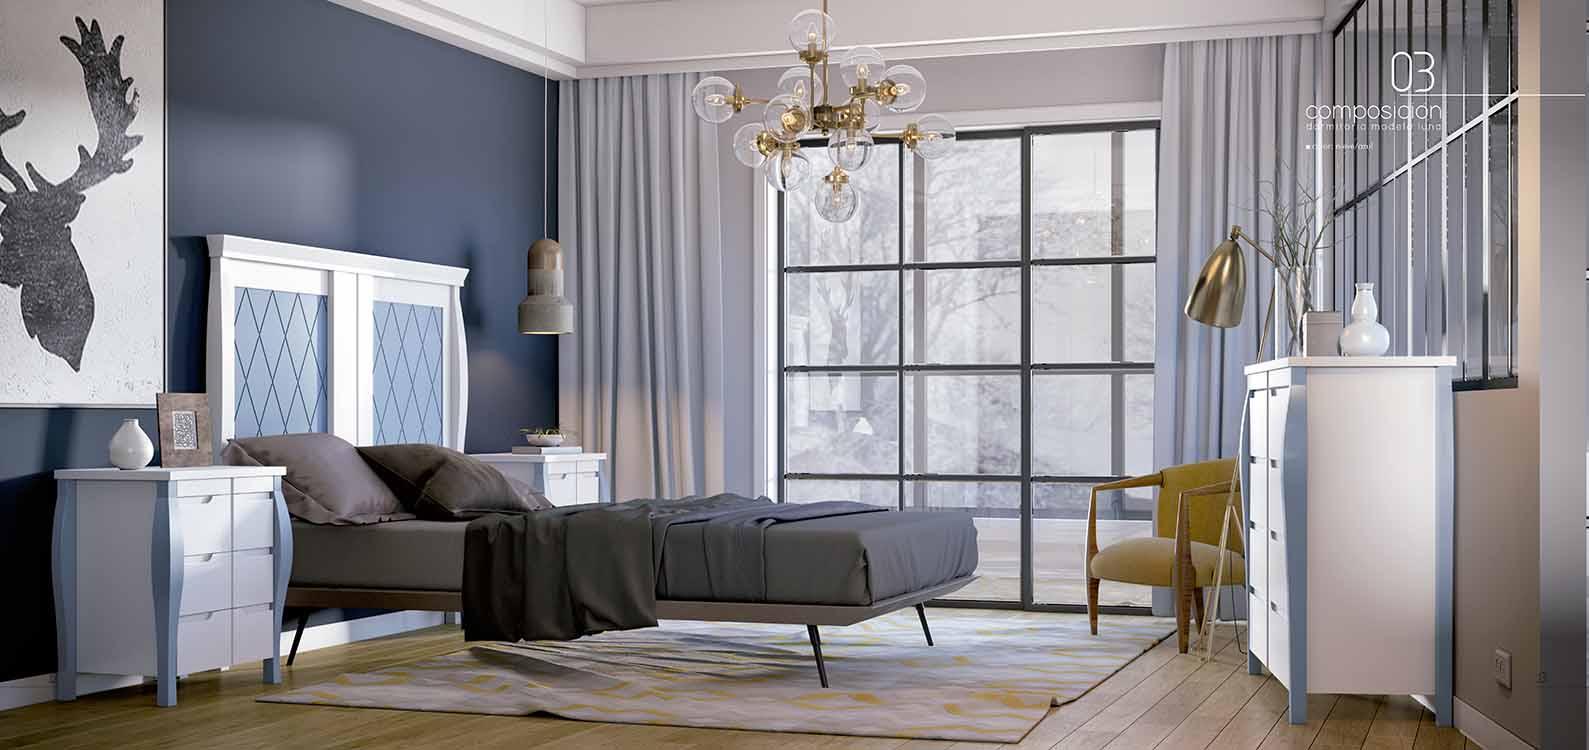 http://www.munozmuebles.net/nueva/catalogo/dormitorios-clasicos.html - Foto con  muebles azules